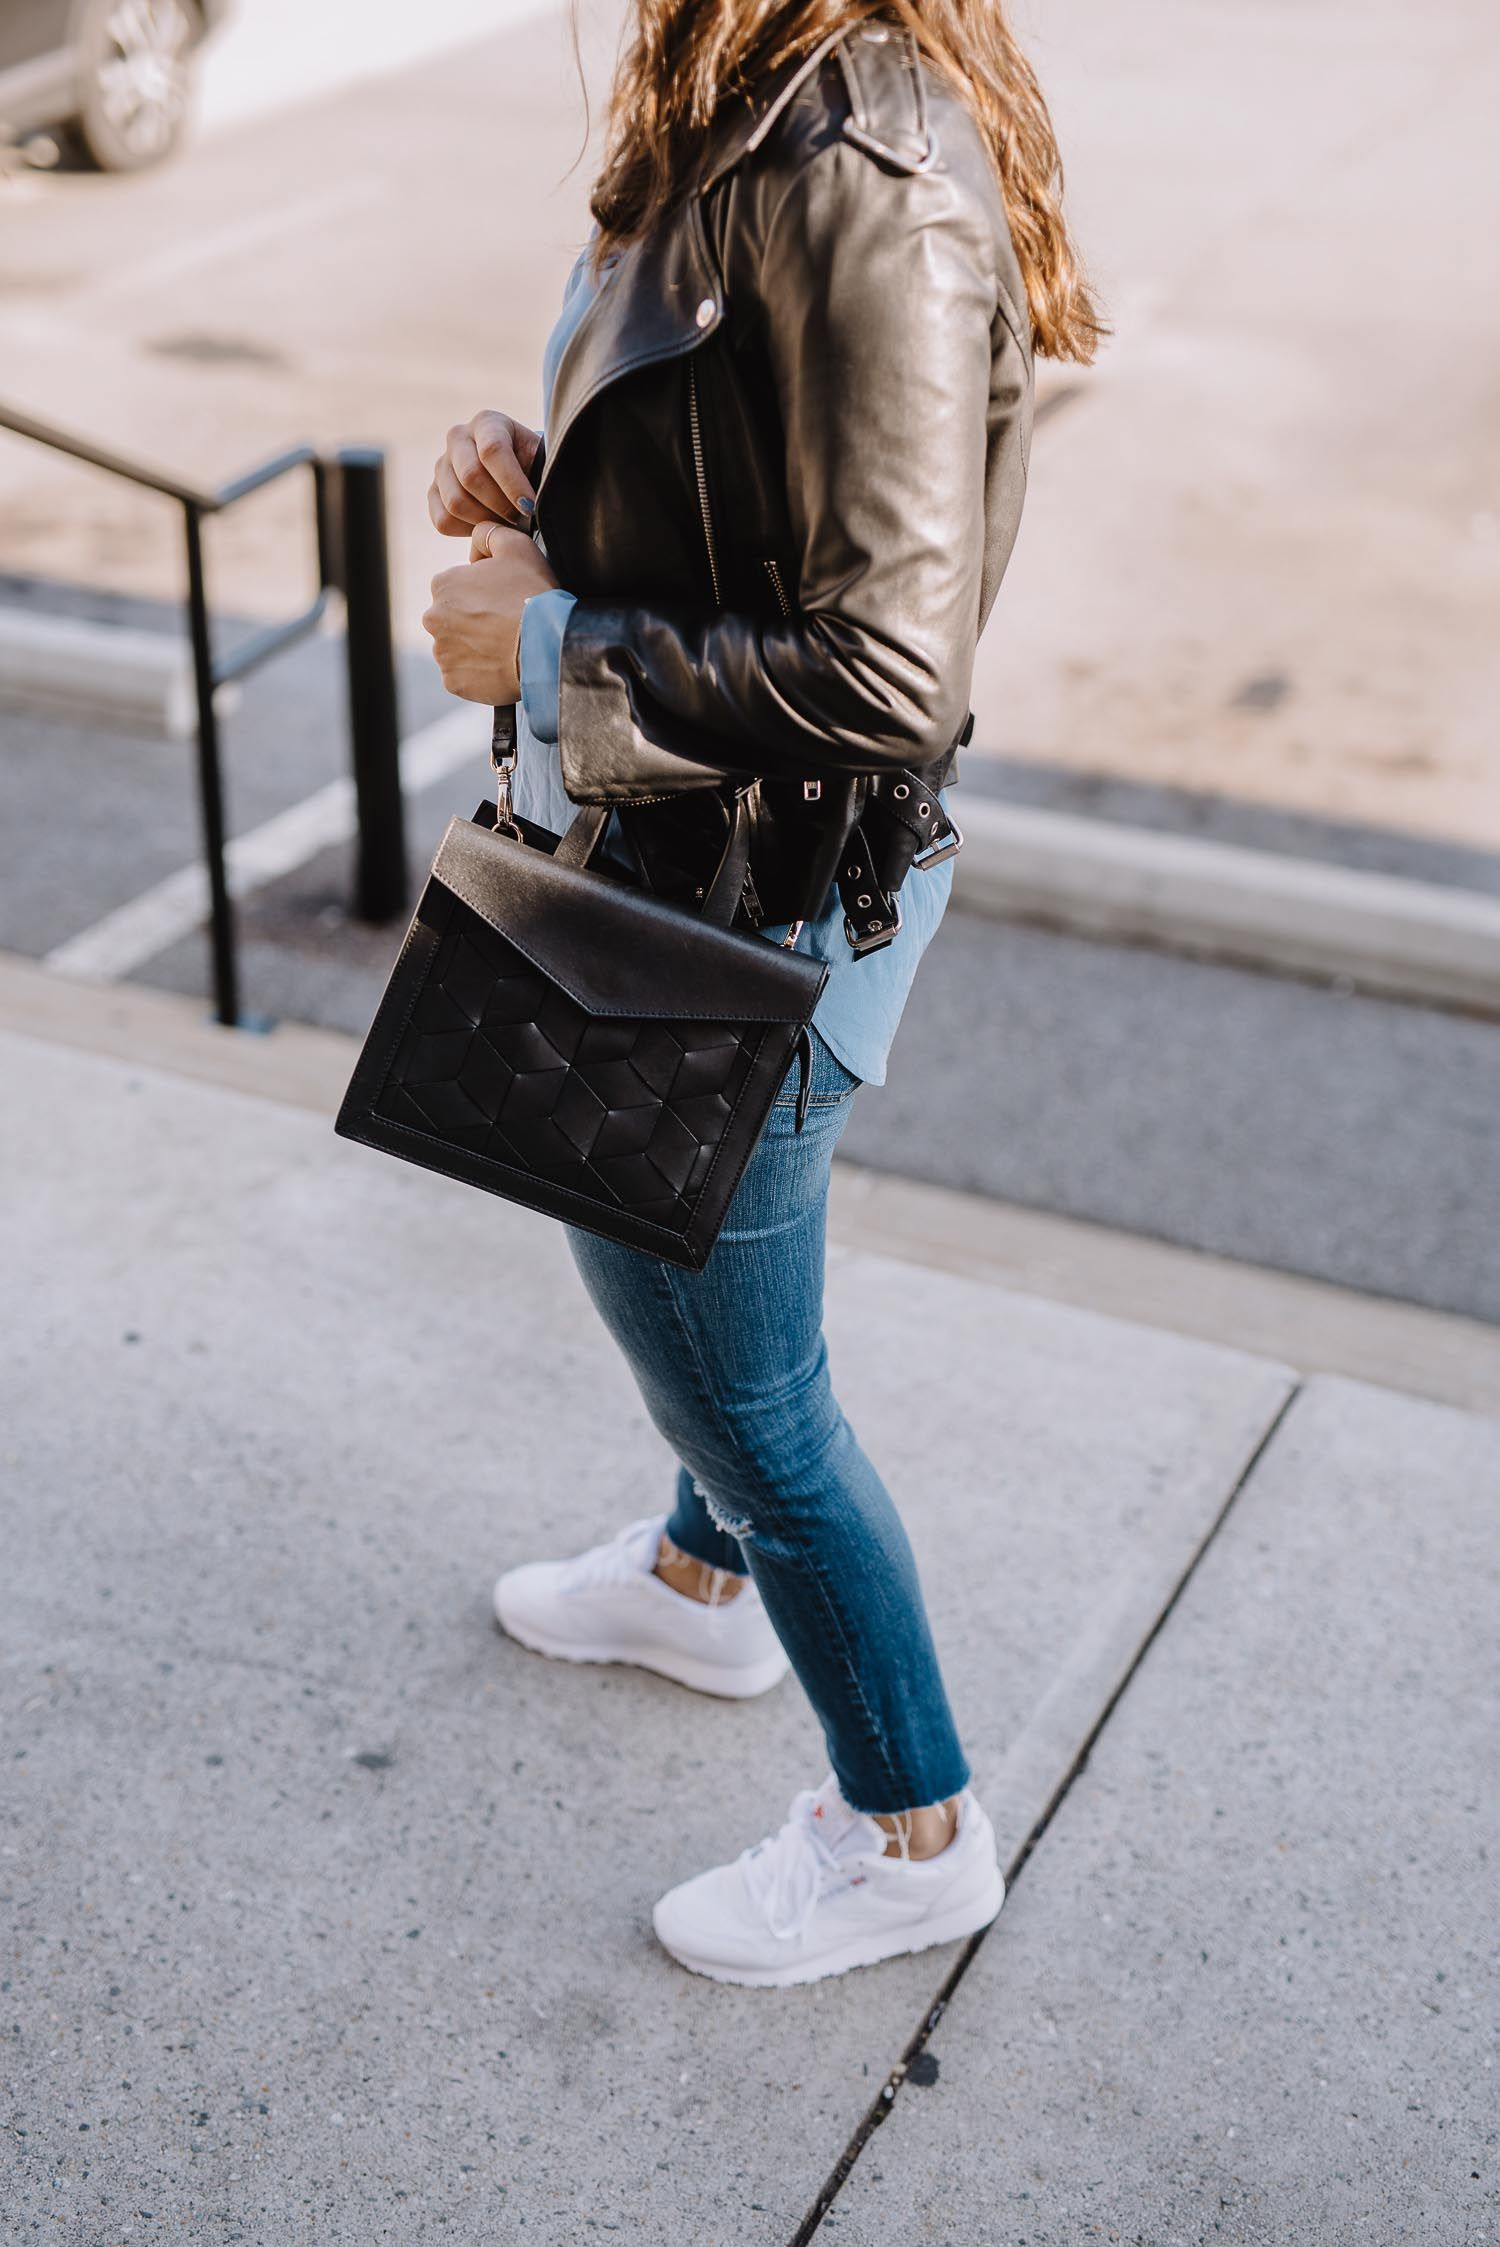 How To Style Reebok Classics Like A Fashion Blogger | White